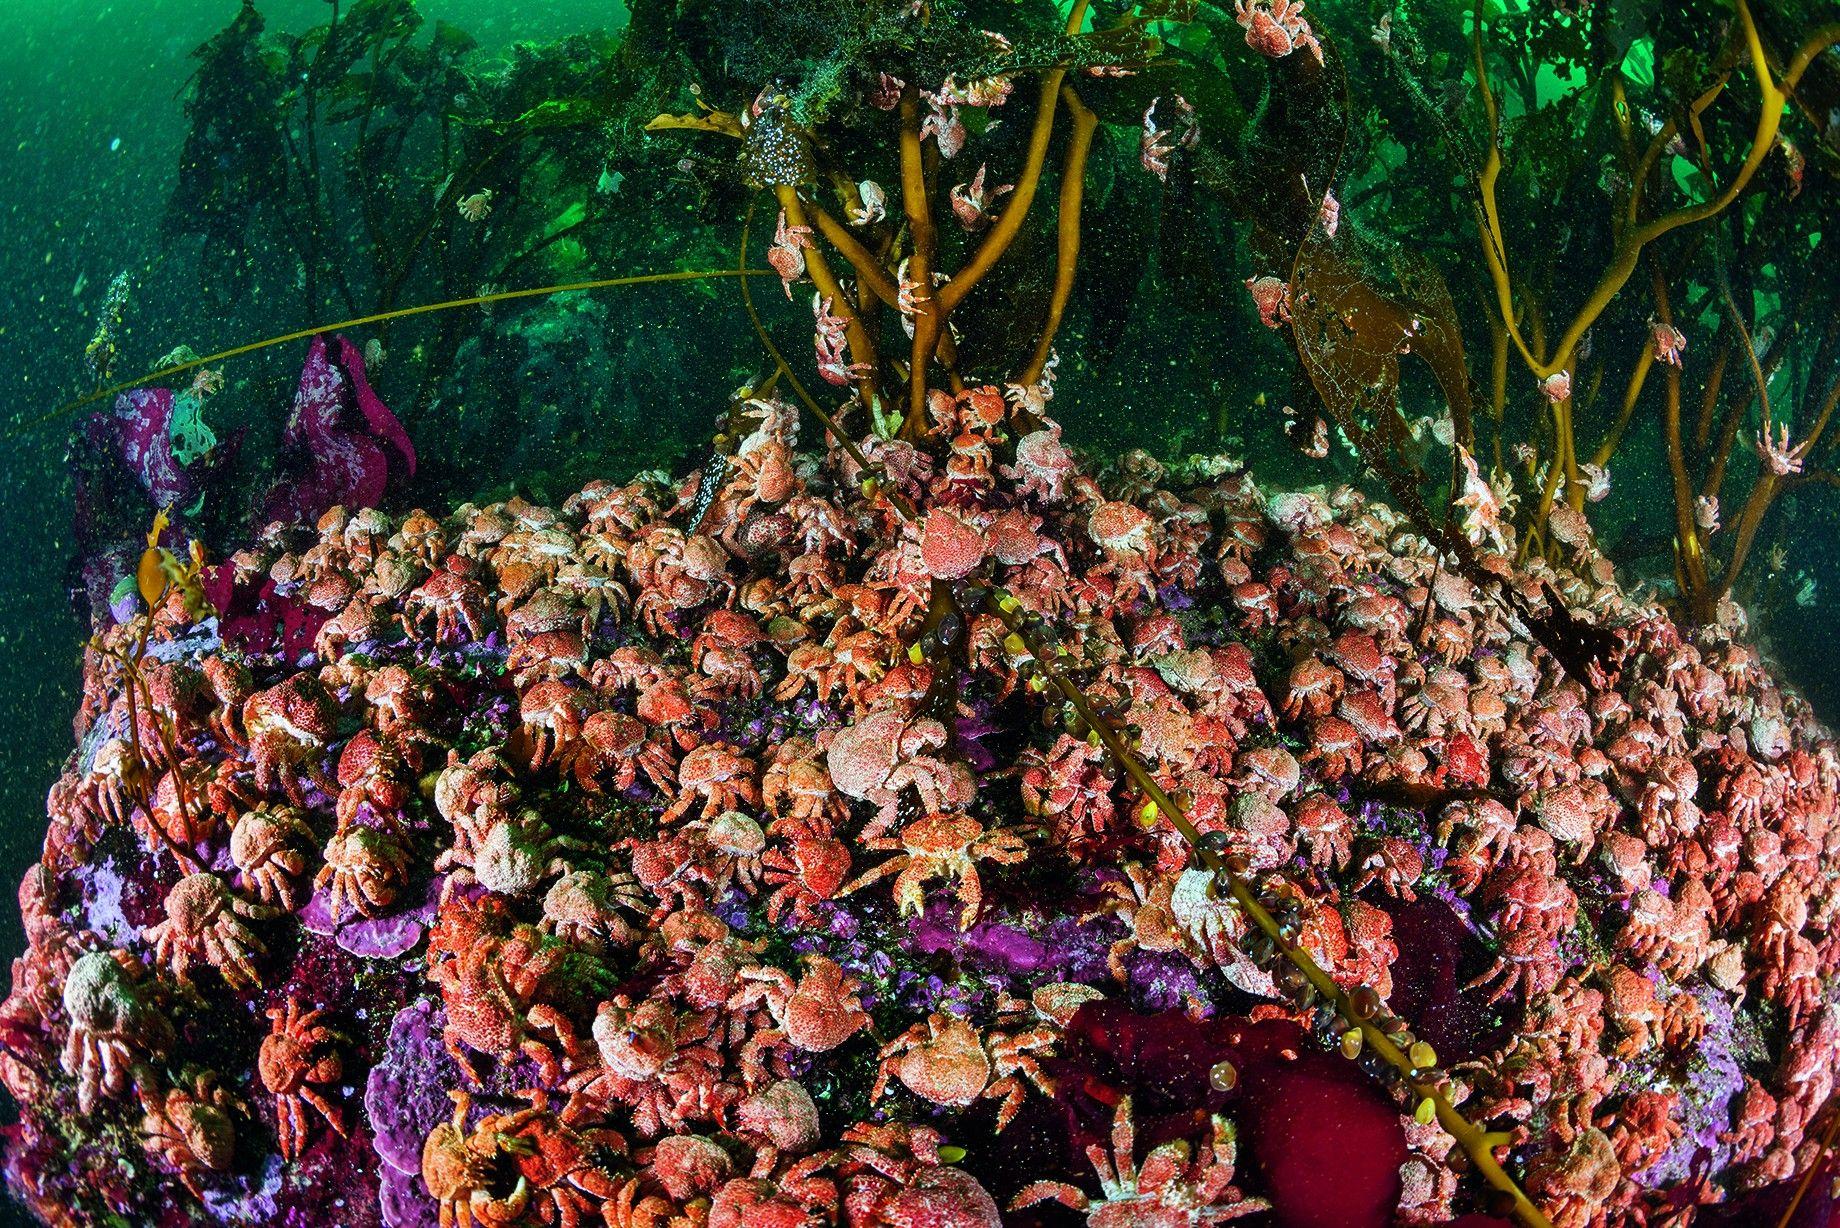 Galerie: Das Meer am Ende der Welt   National Geographic